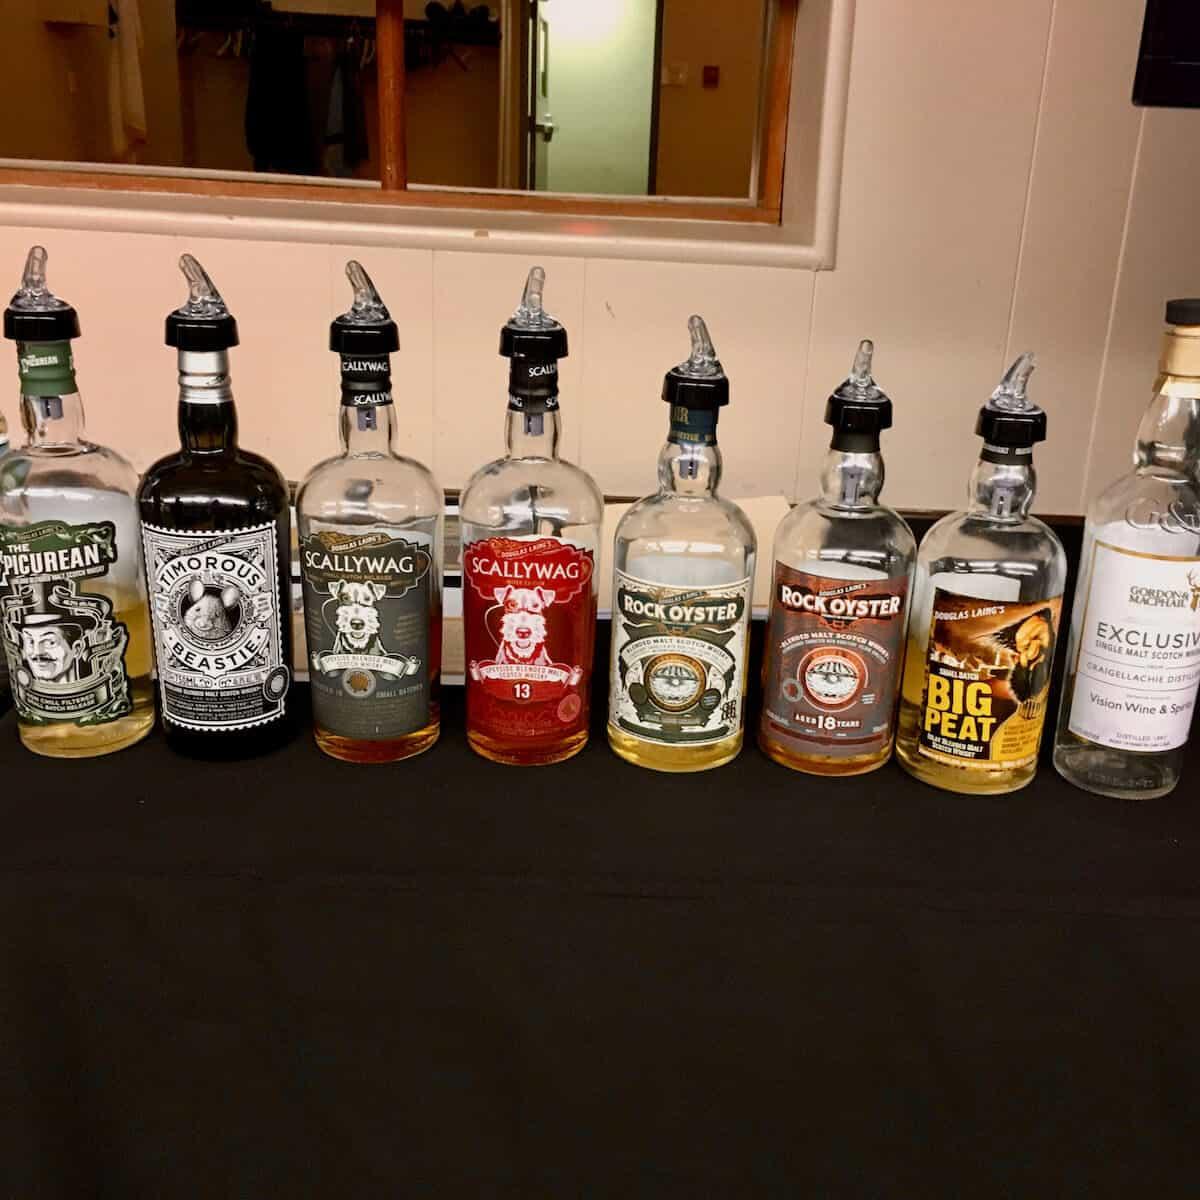 Douglas Laing Remarkable Regional Malt lineup in bottles on a table.